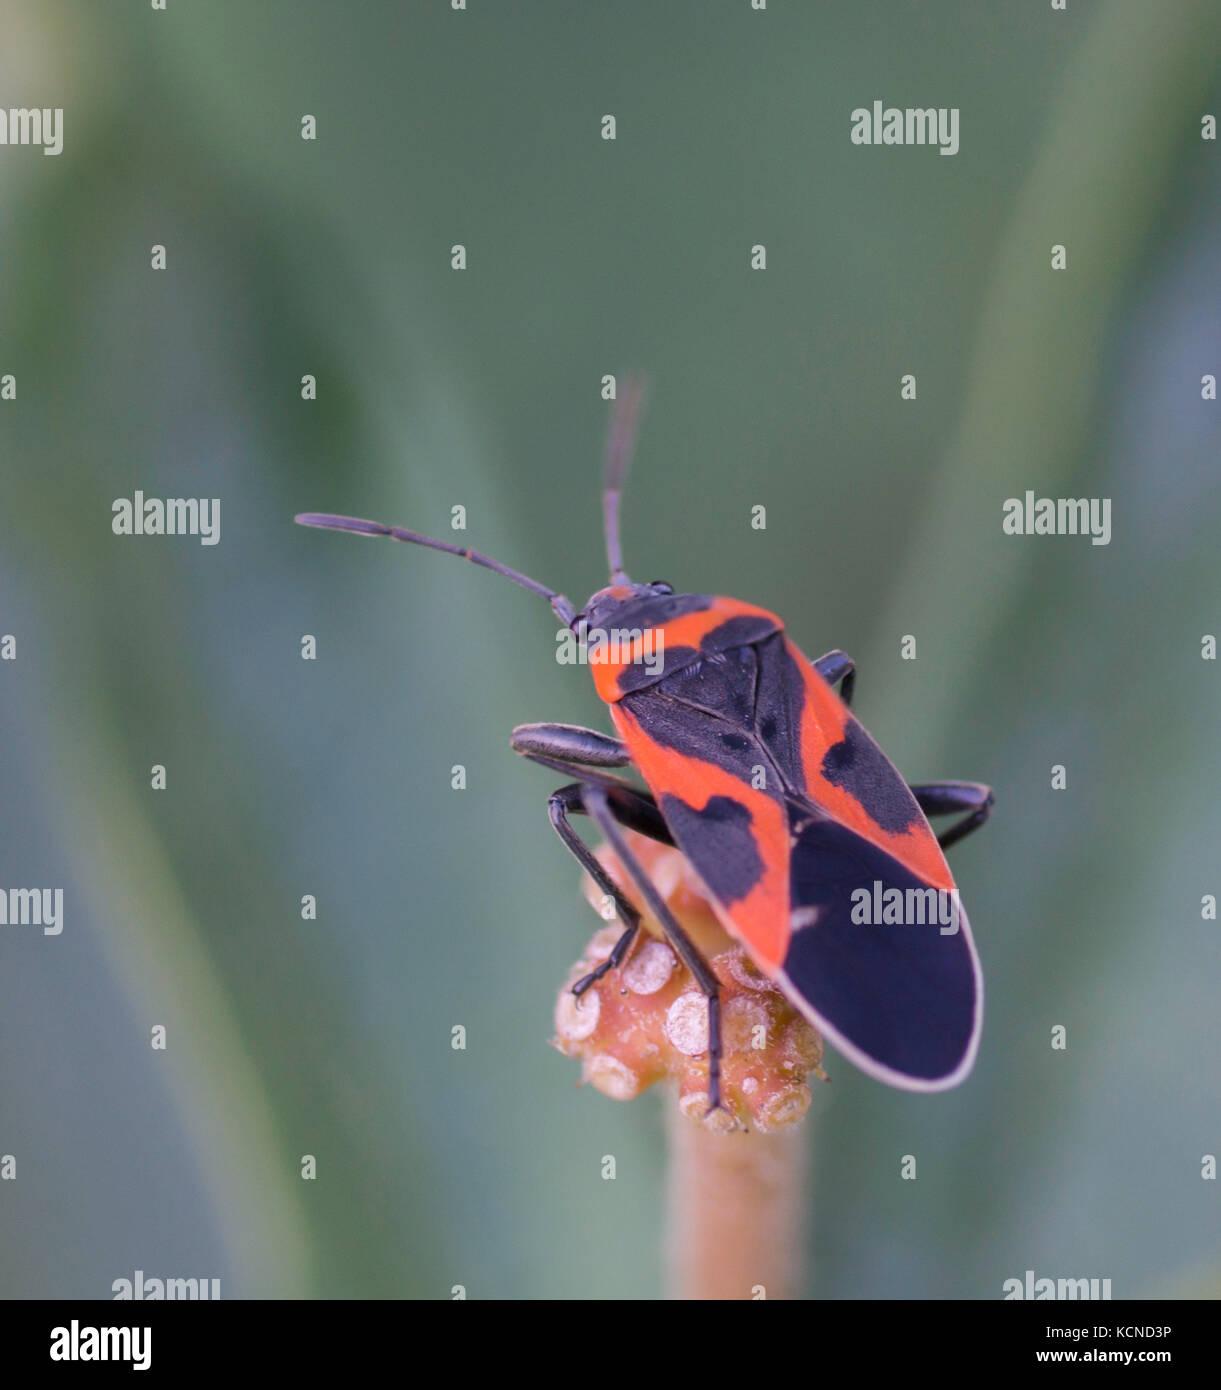 Small Eastern Milkweed Bug, Lygaeus kalmii, North Eastern Ontario, Canada Stock Photo